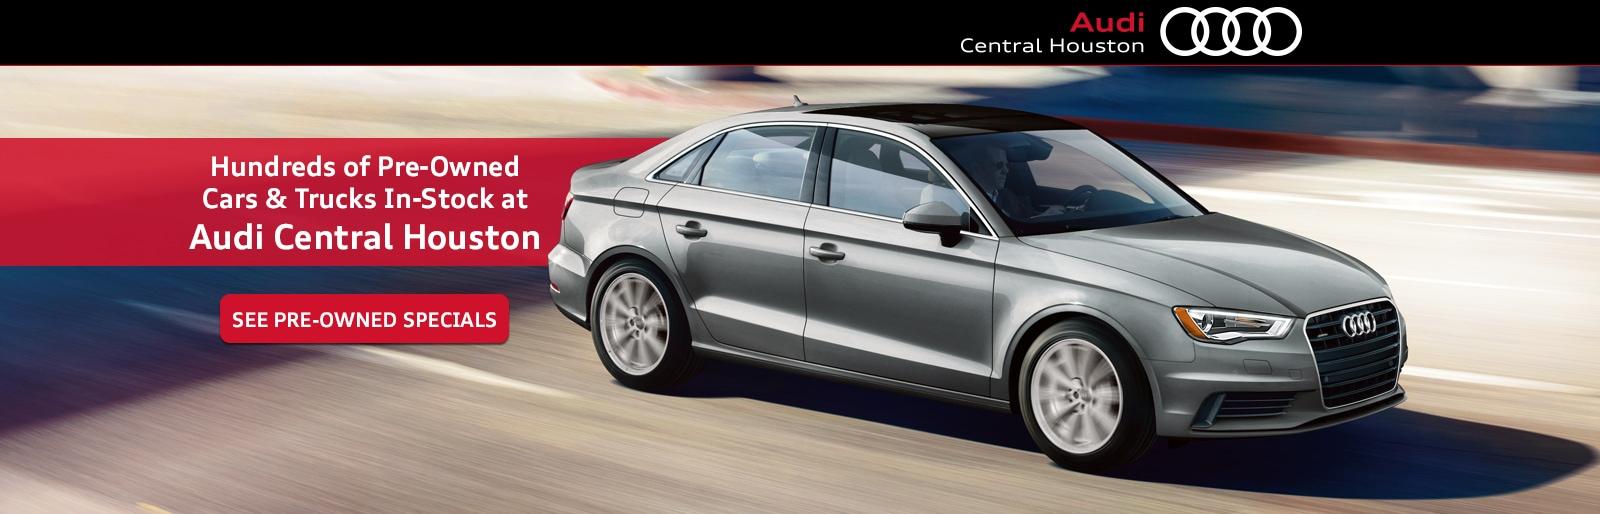 Audi Central Houston Audi Dealership In Houston TX - Houston audi